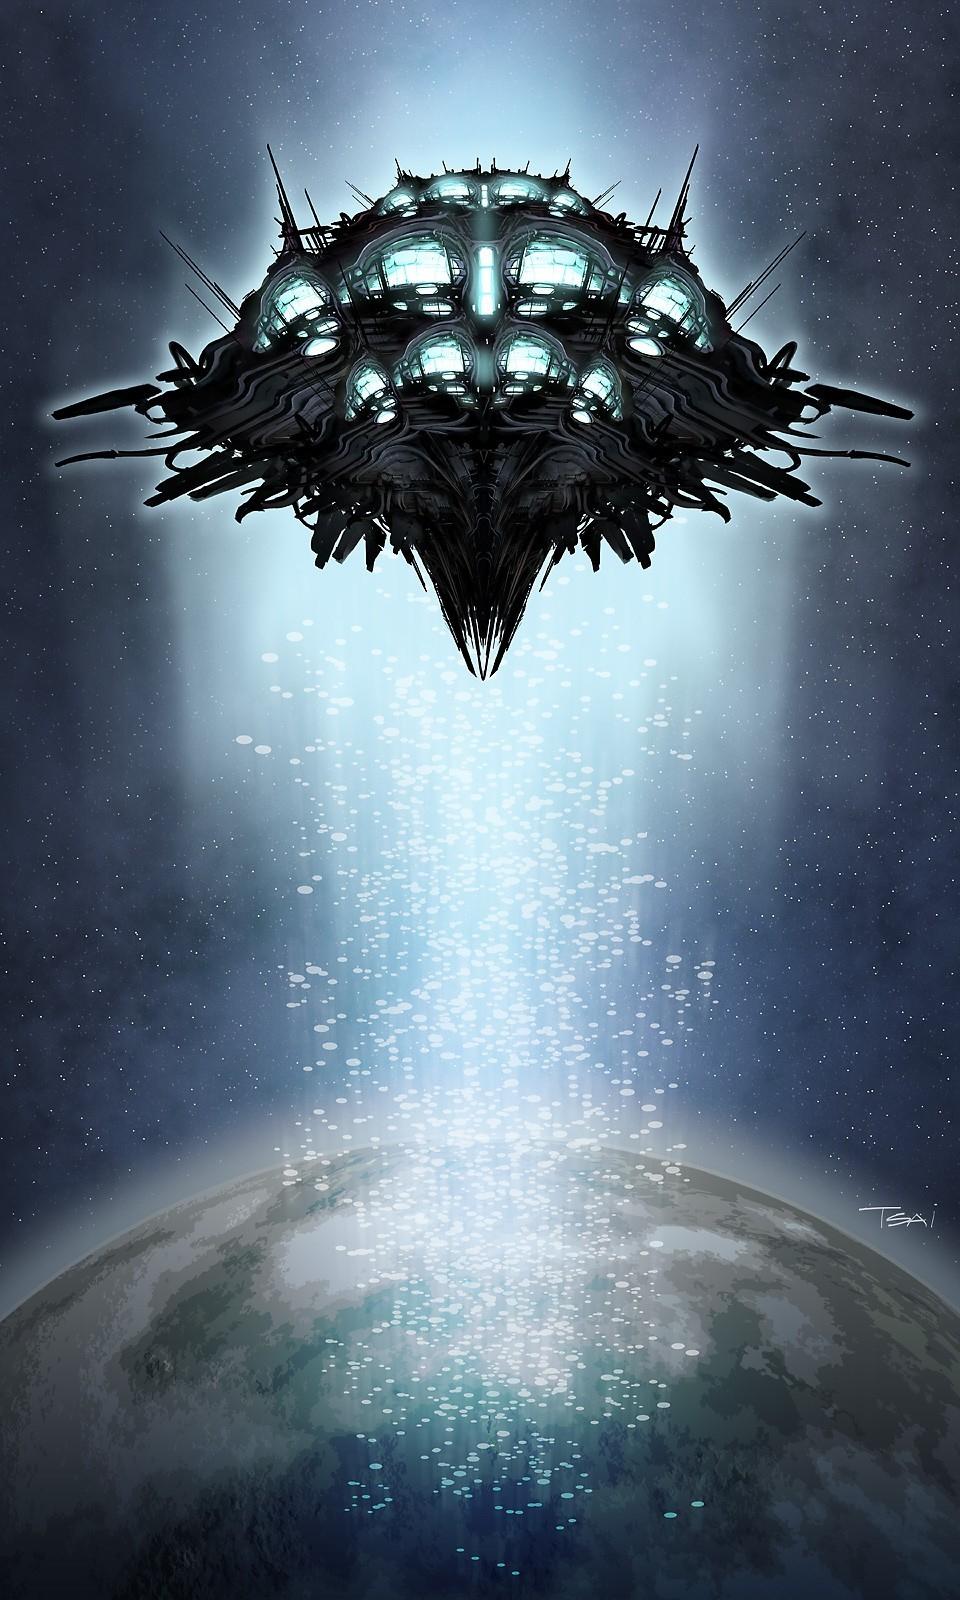 Francis001 starship 1 443f26e5 kswp